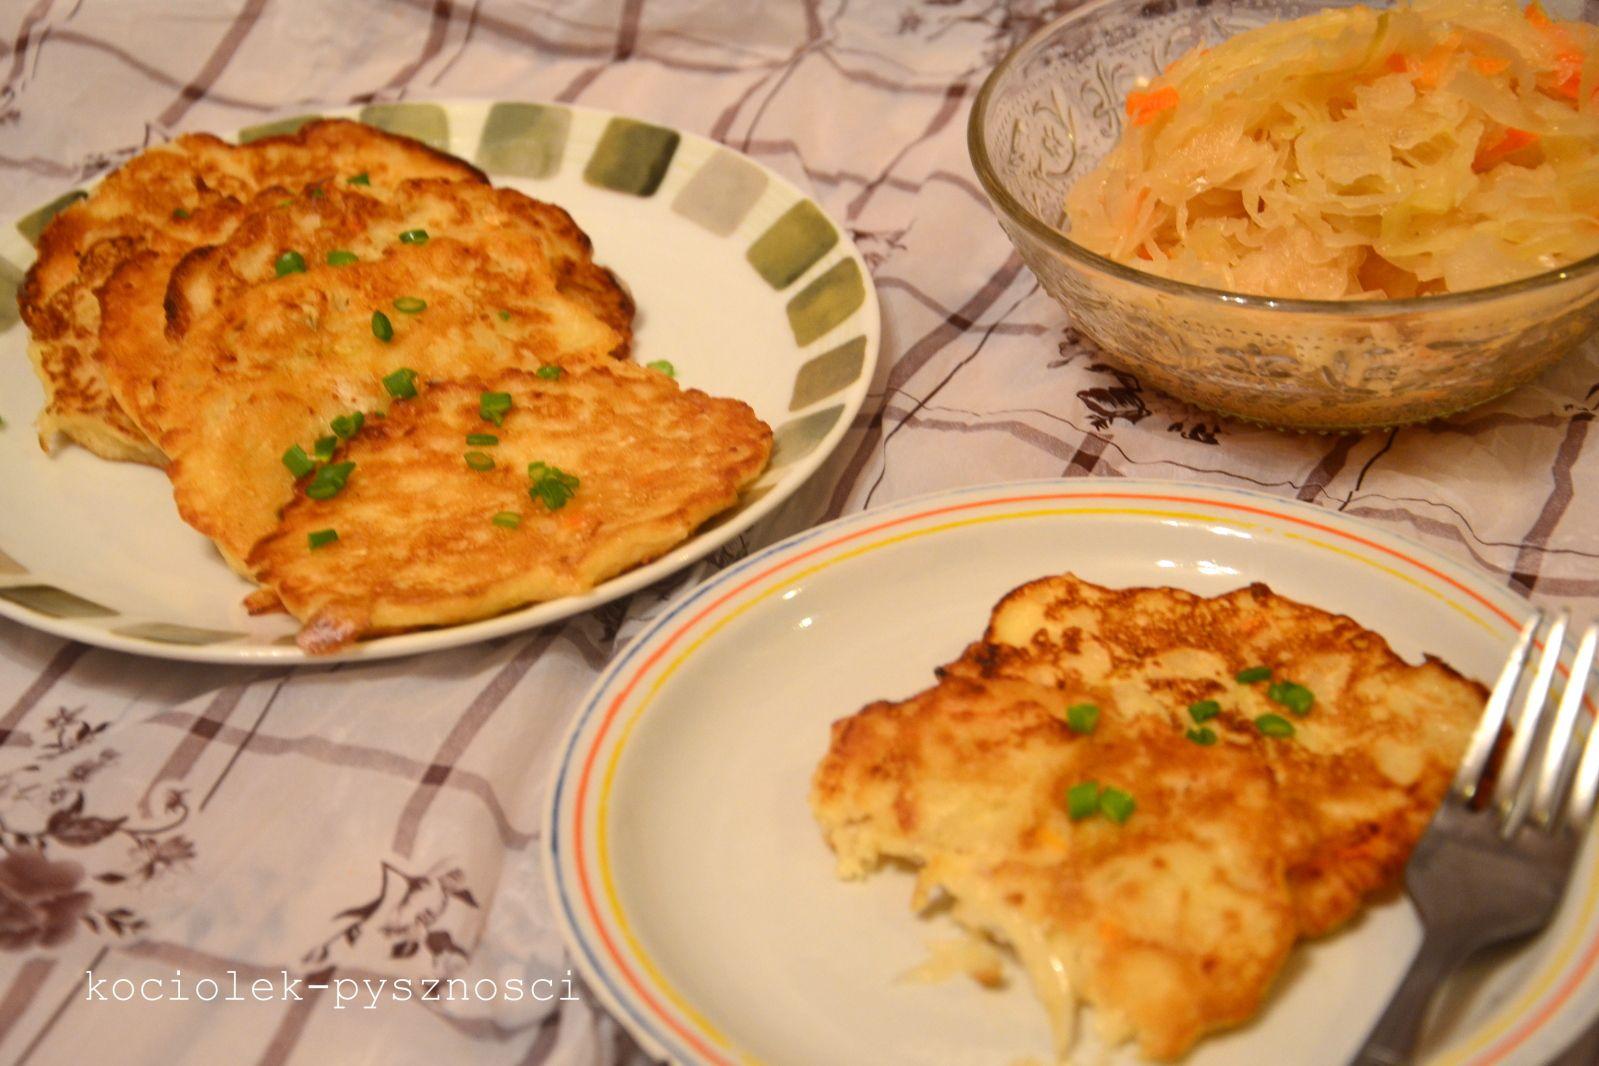 Obiad kociolekpysznosci Food, Recipes, Tasty